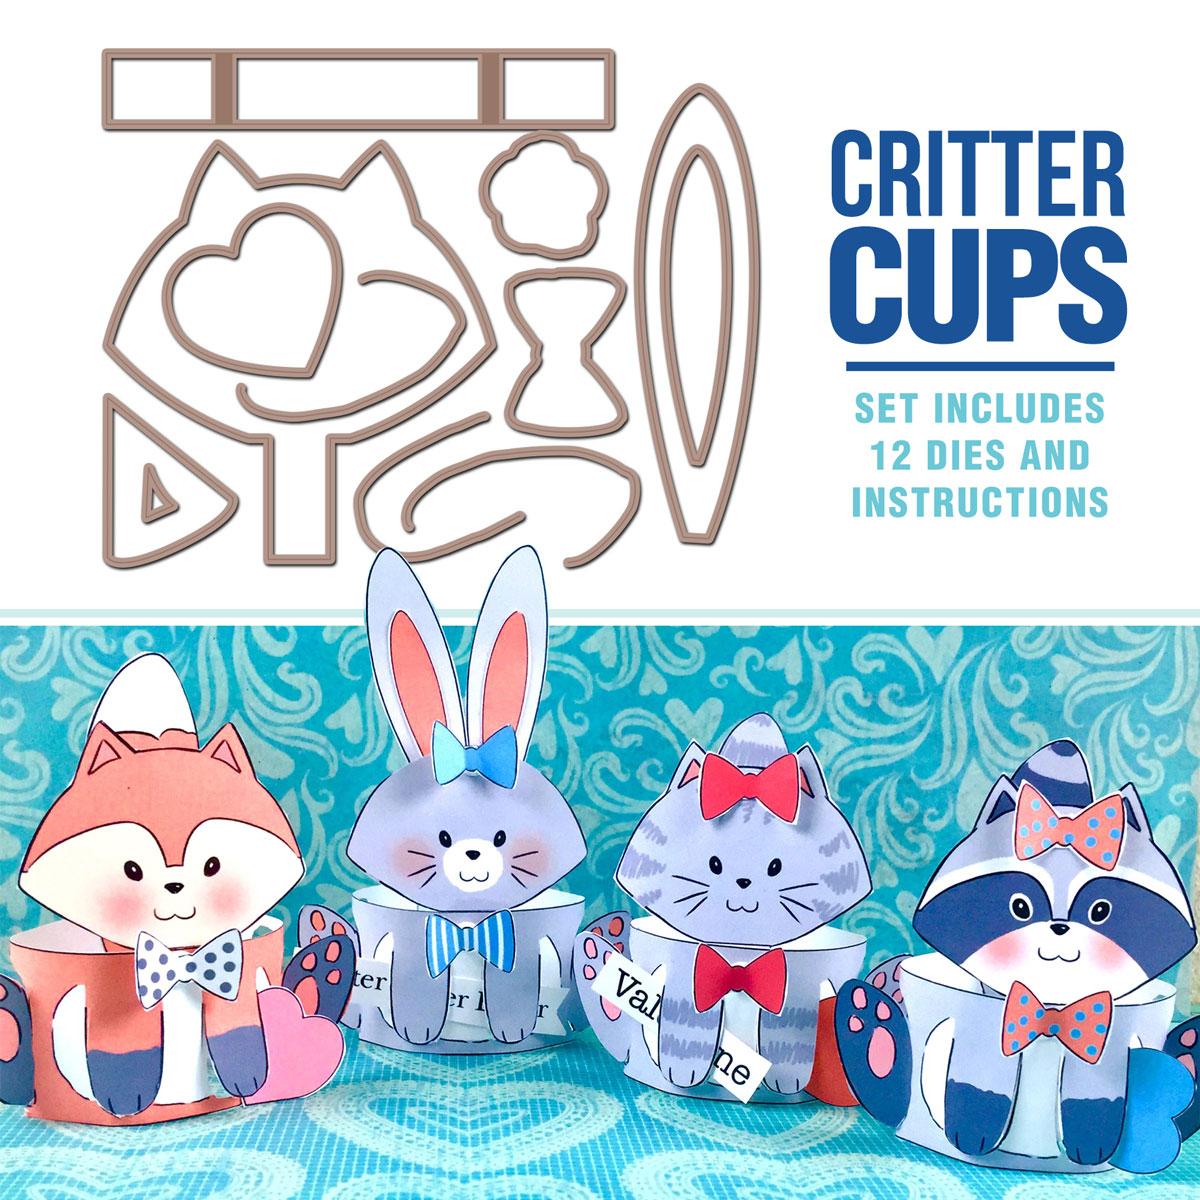 Critter Cups